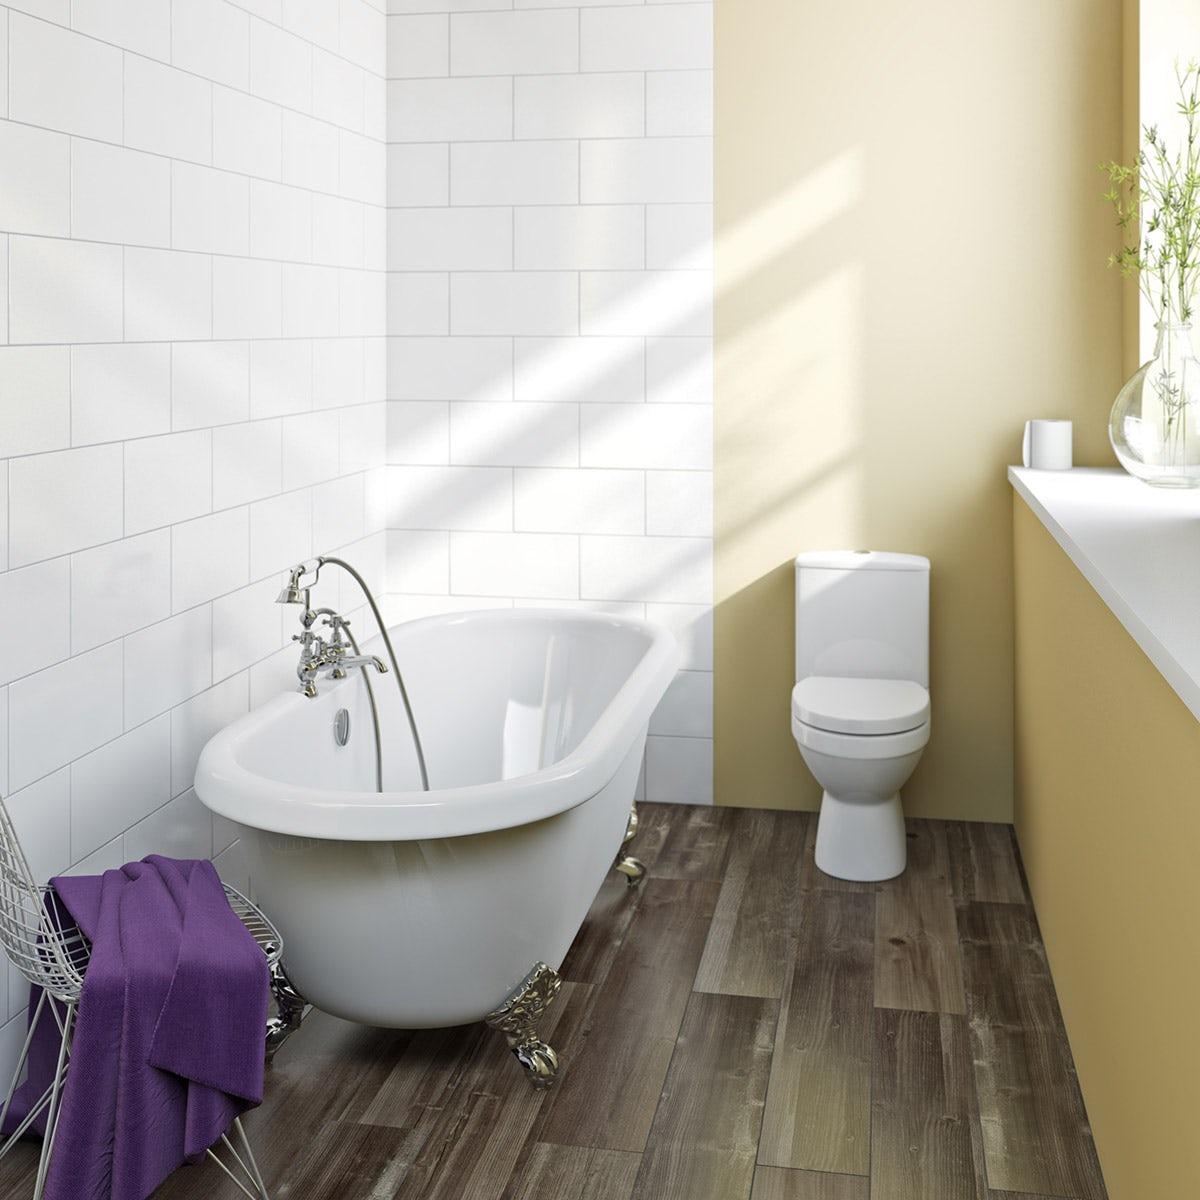 Best Paint Brand For Bathroom: Craig Rose Daisy Chain Kitchen Bathroom Paint 2.5L